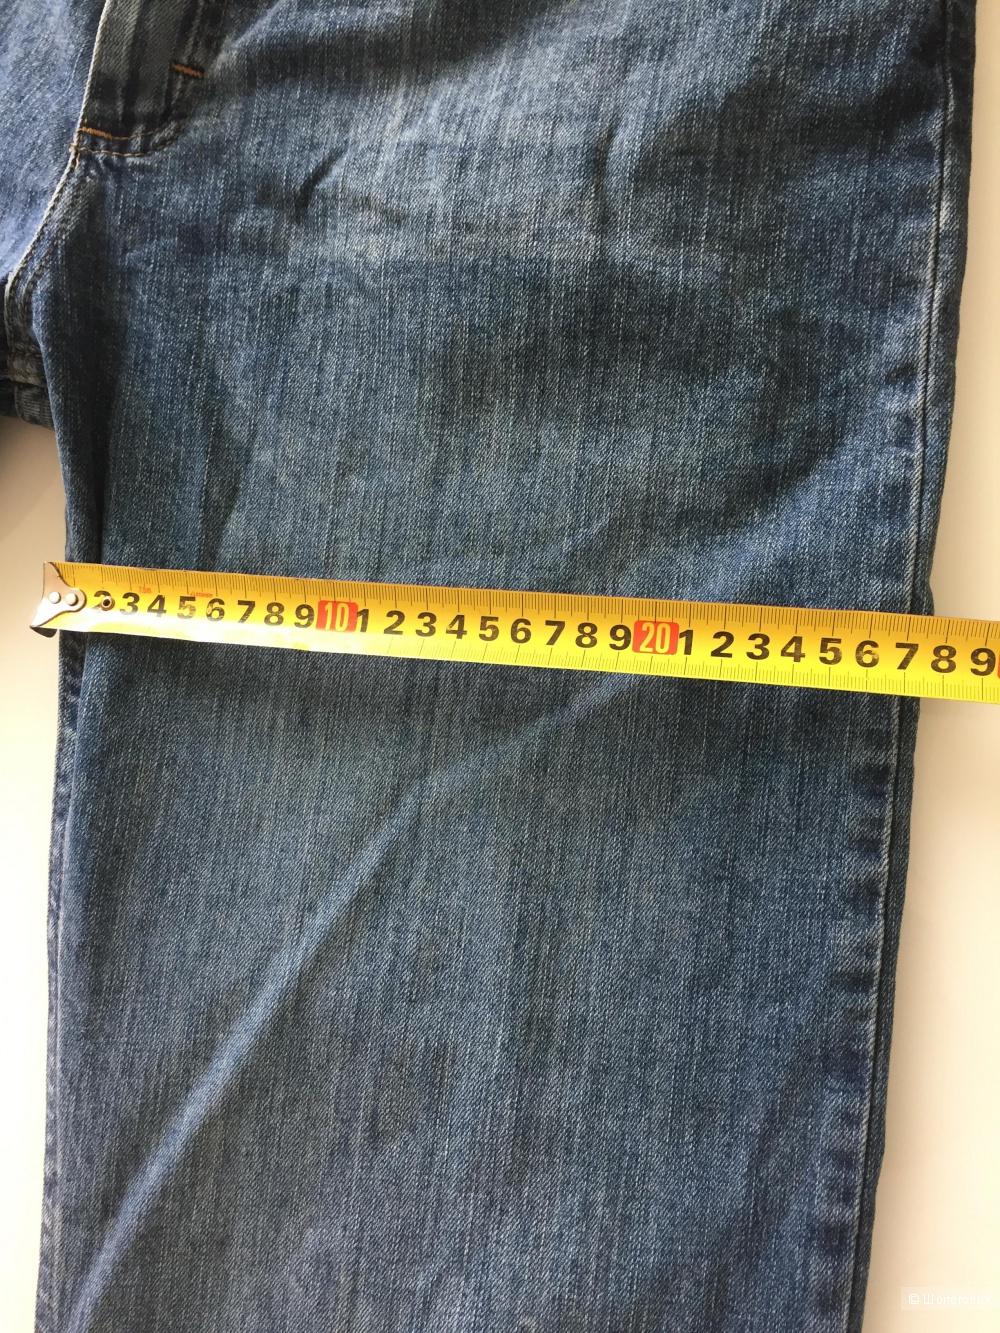 Джинсы Wrangler, размер 50-52